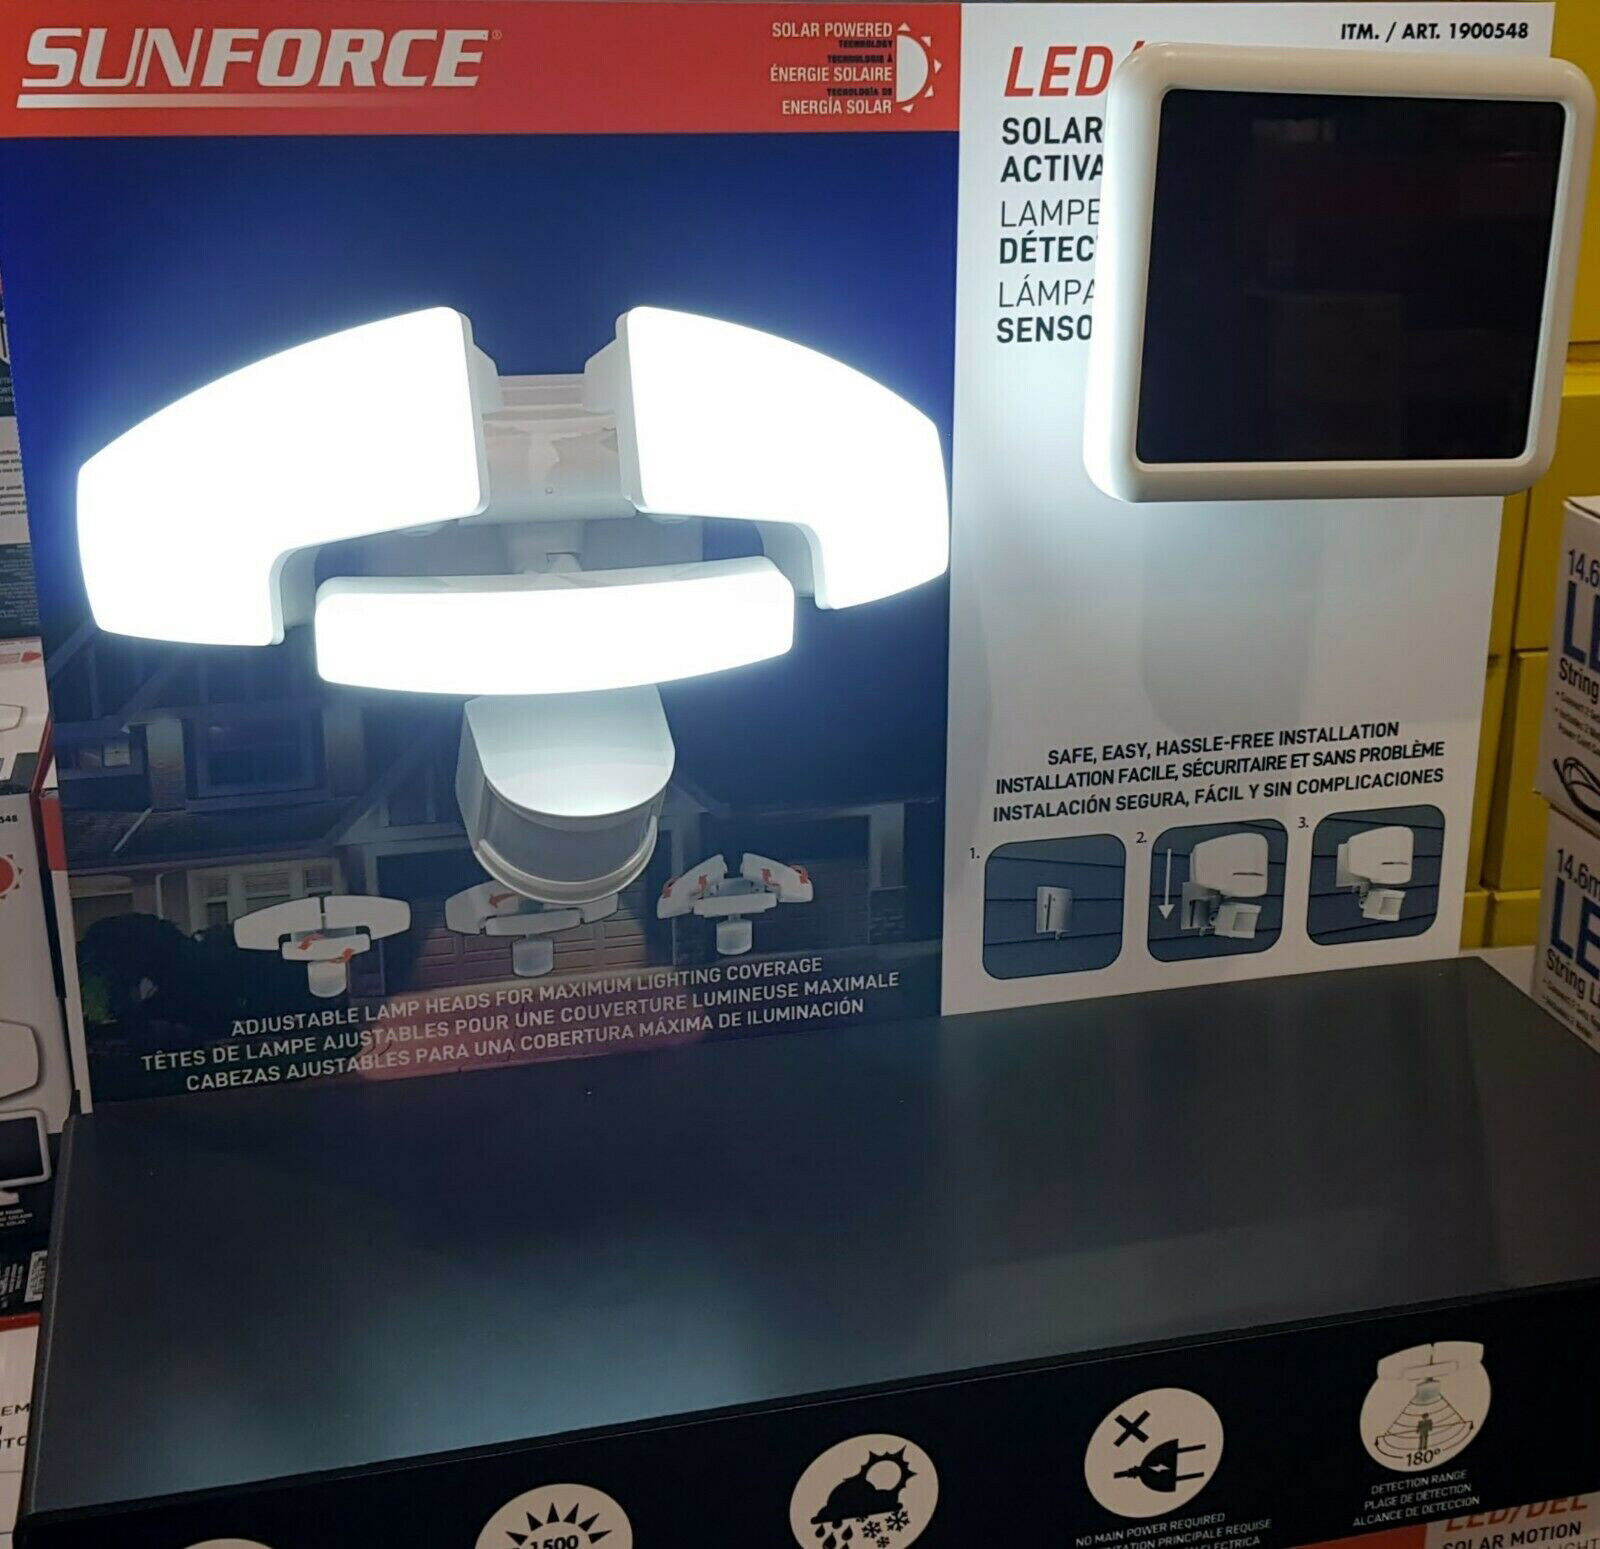 Sunforce Triple Sensor Solar de movimiento activada Solar LED Luz Brillante 1500 lúmenes